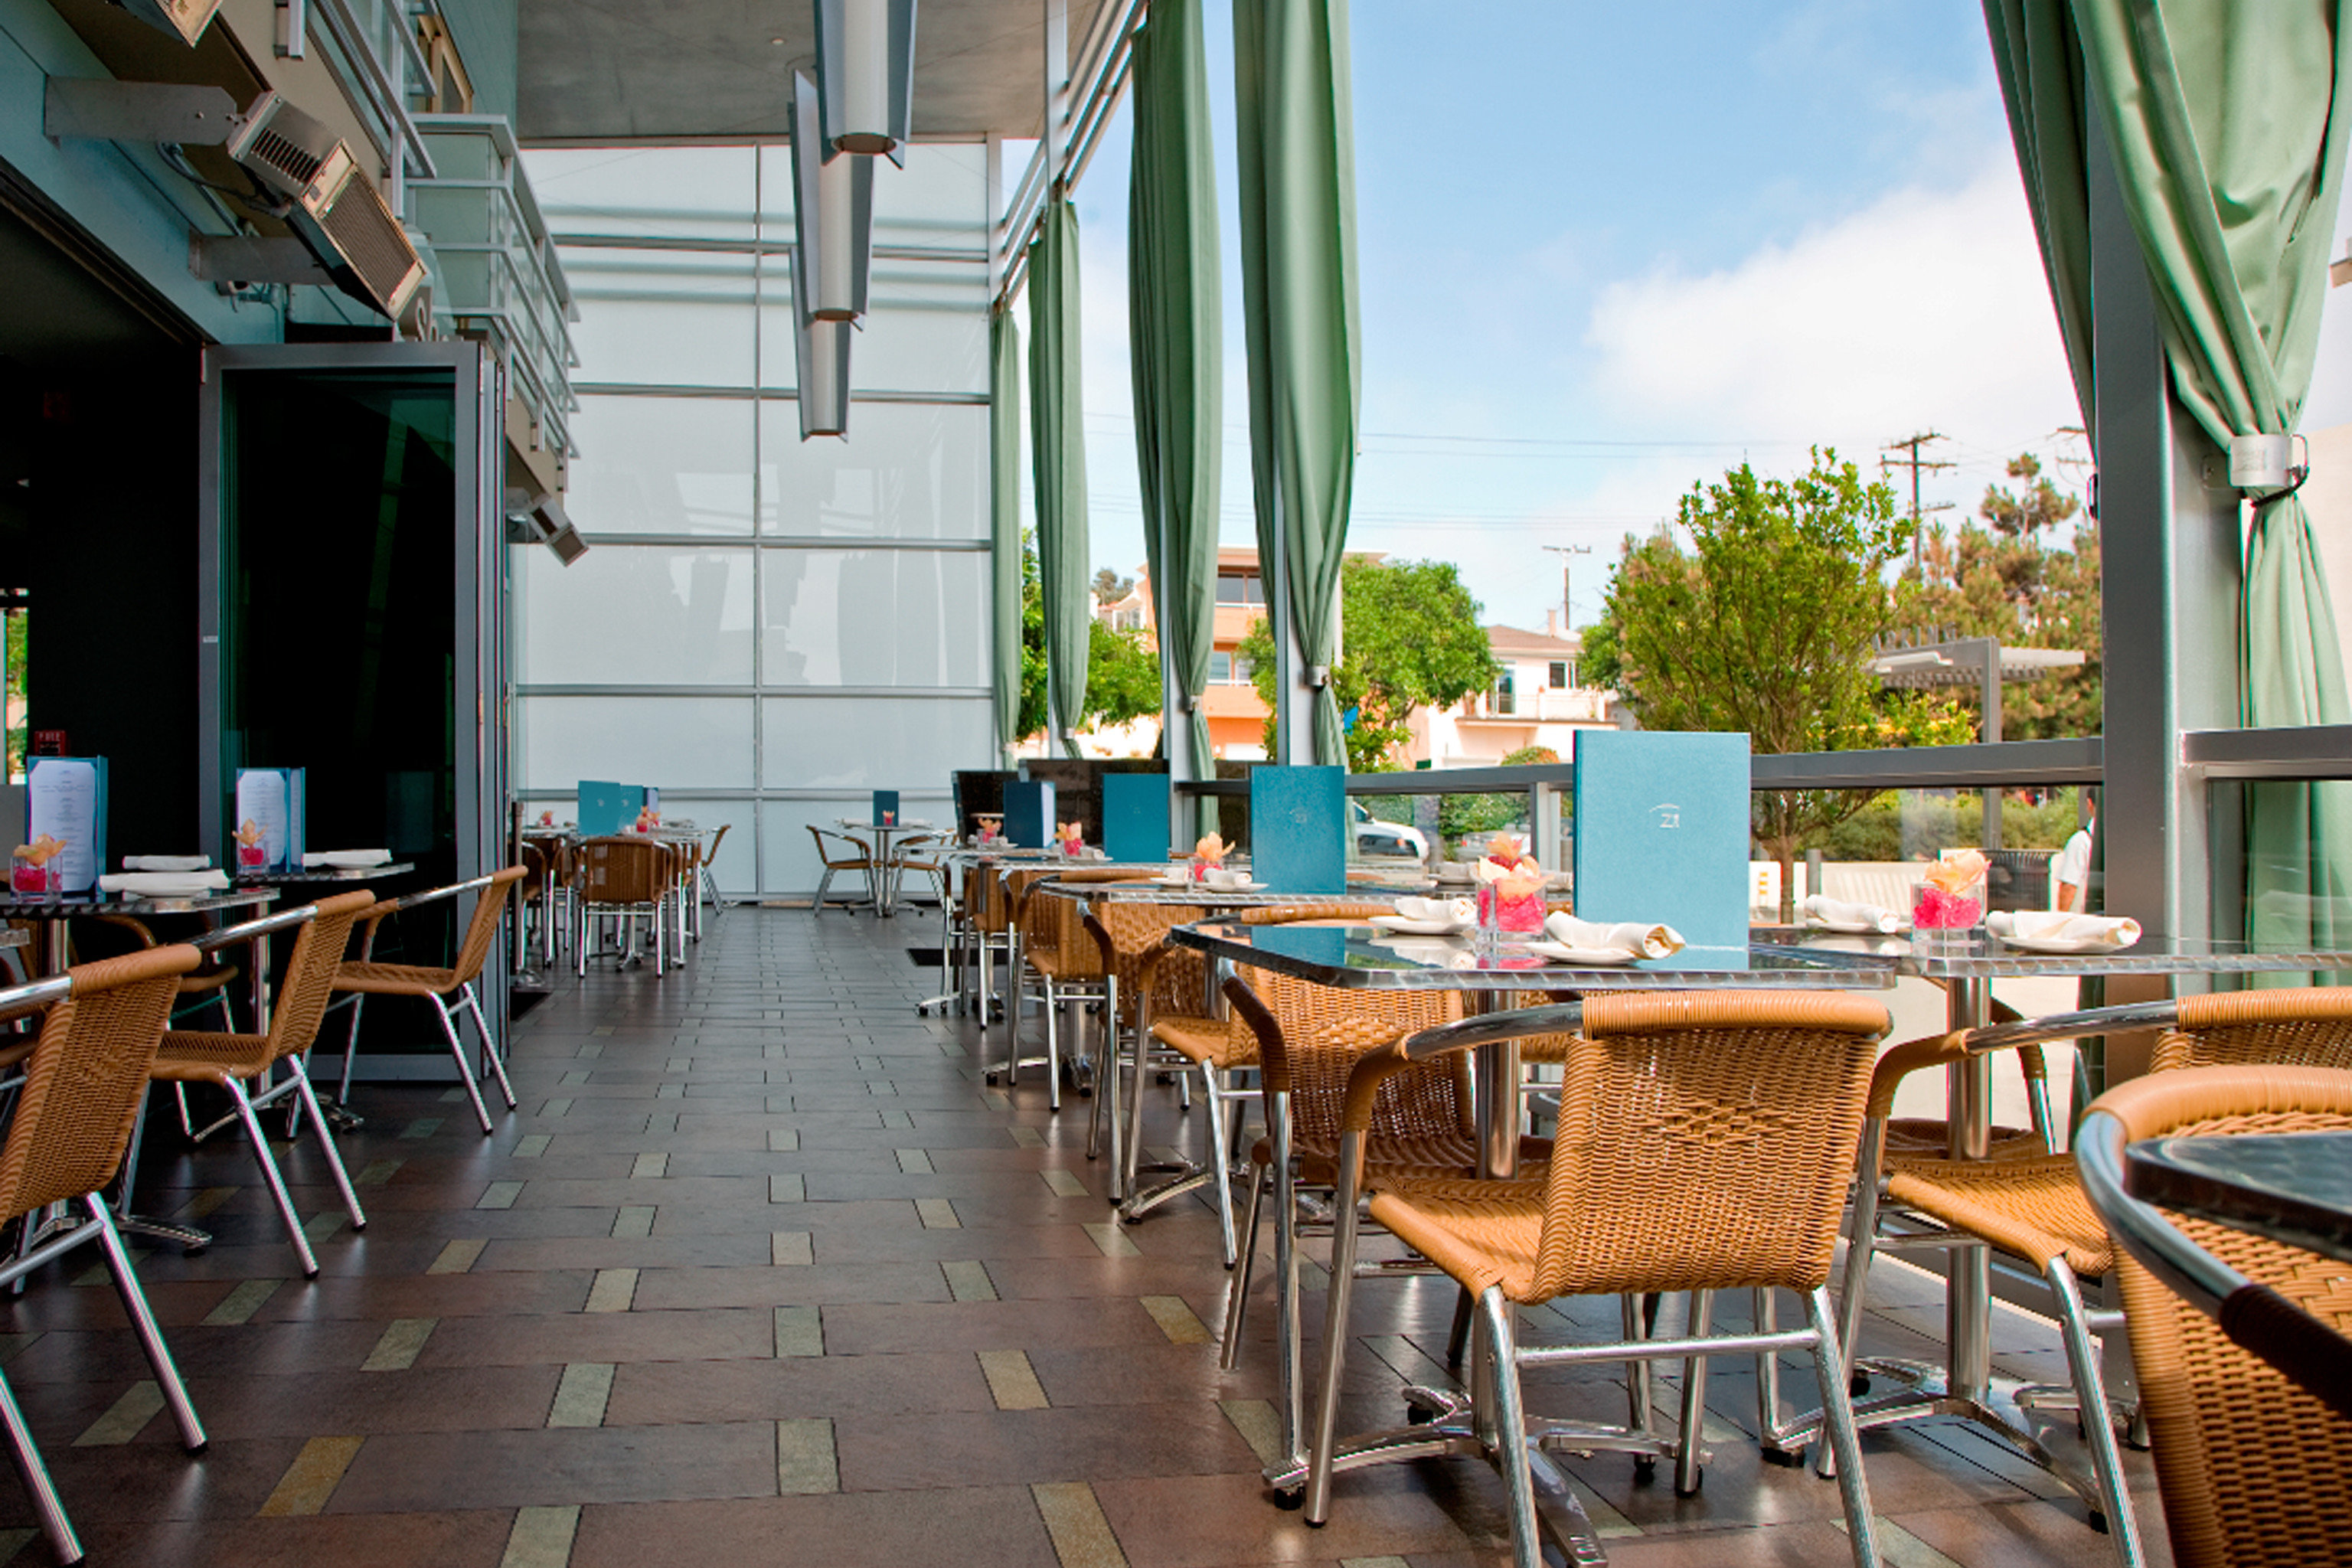 Bar Dining Drink Eat Modern chair property restaurant Resort